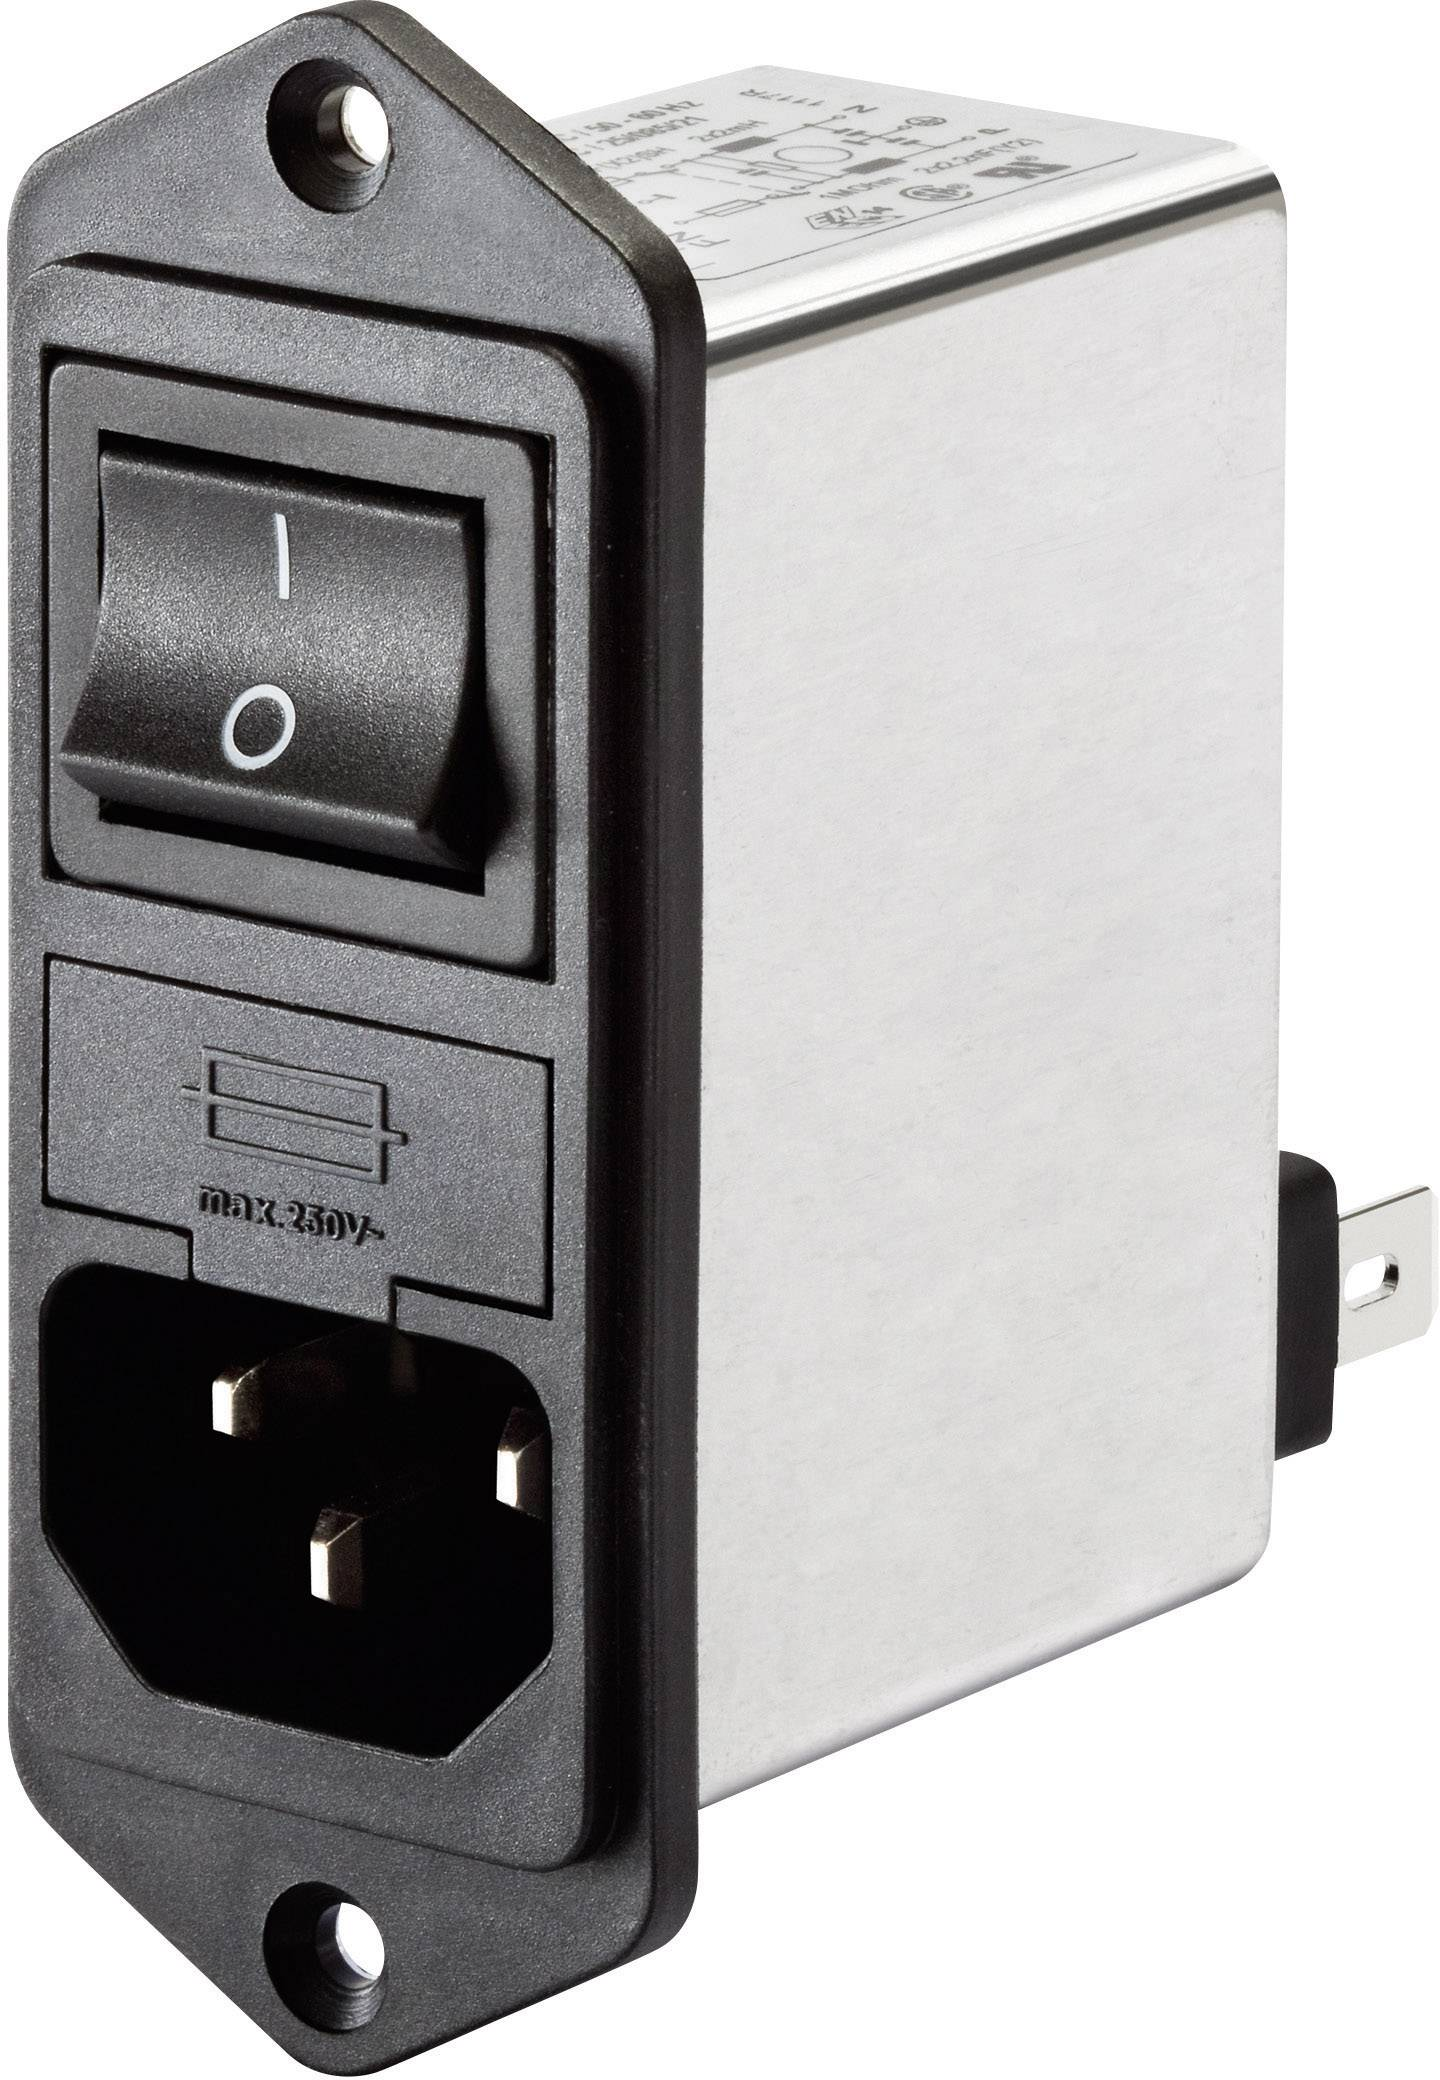 Síťový filtr Schaffner, FN 281-6-06, 0,45 mH, 250 V/AC, 6 A